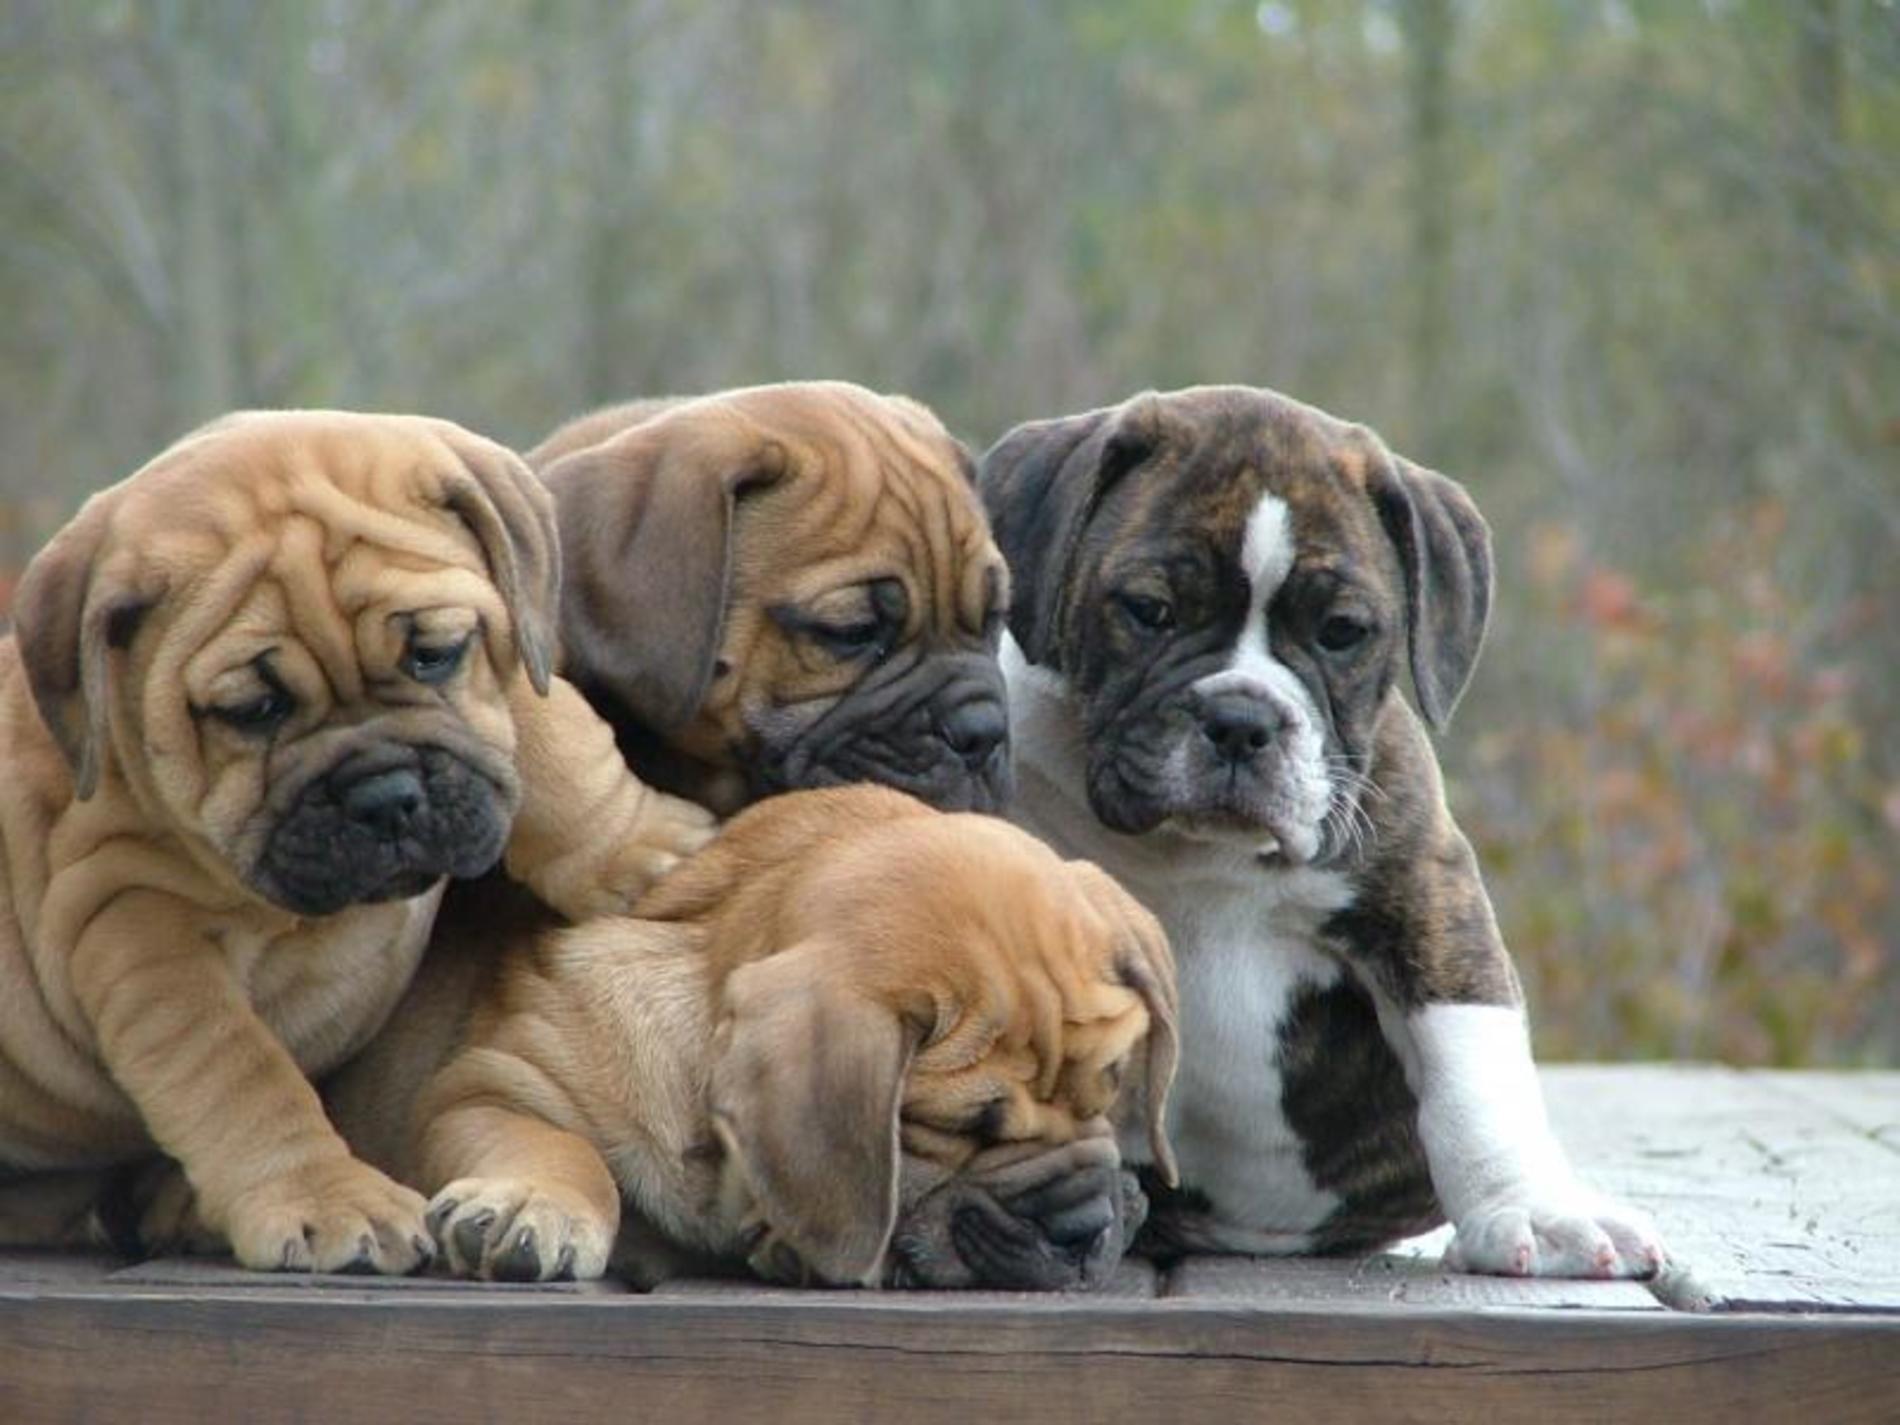 bulldog wallpaper puppy - HD Desktop Wallpapers | 4k HD